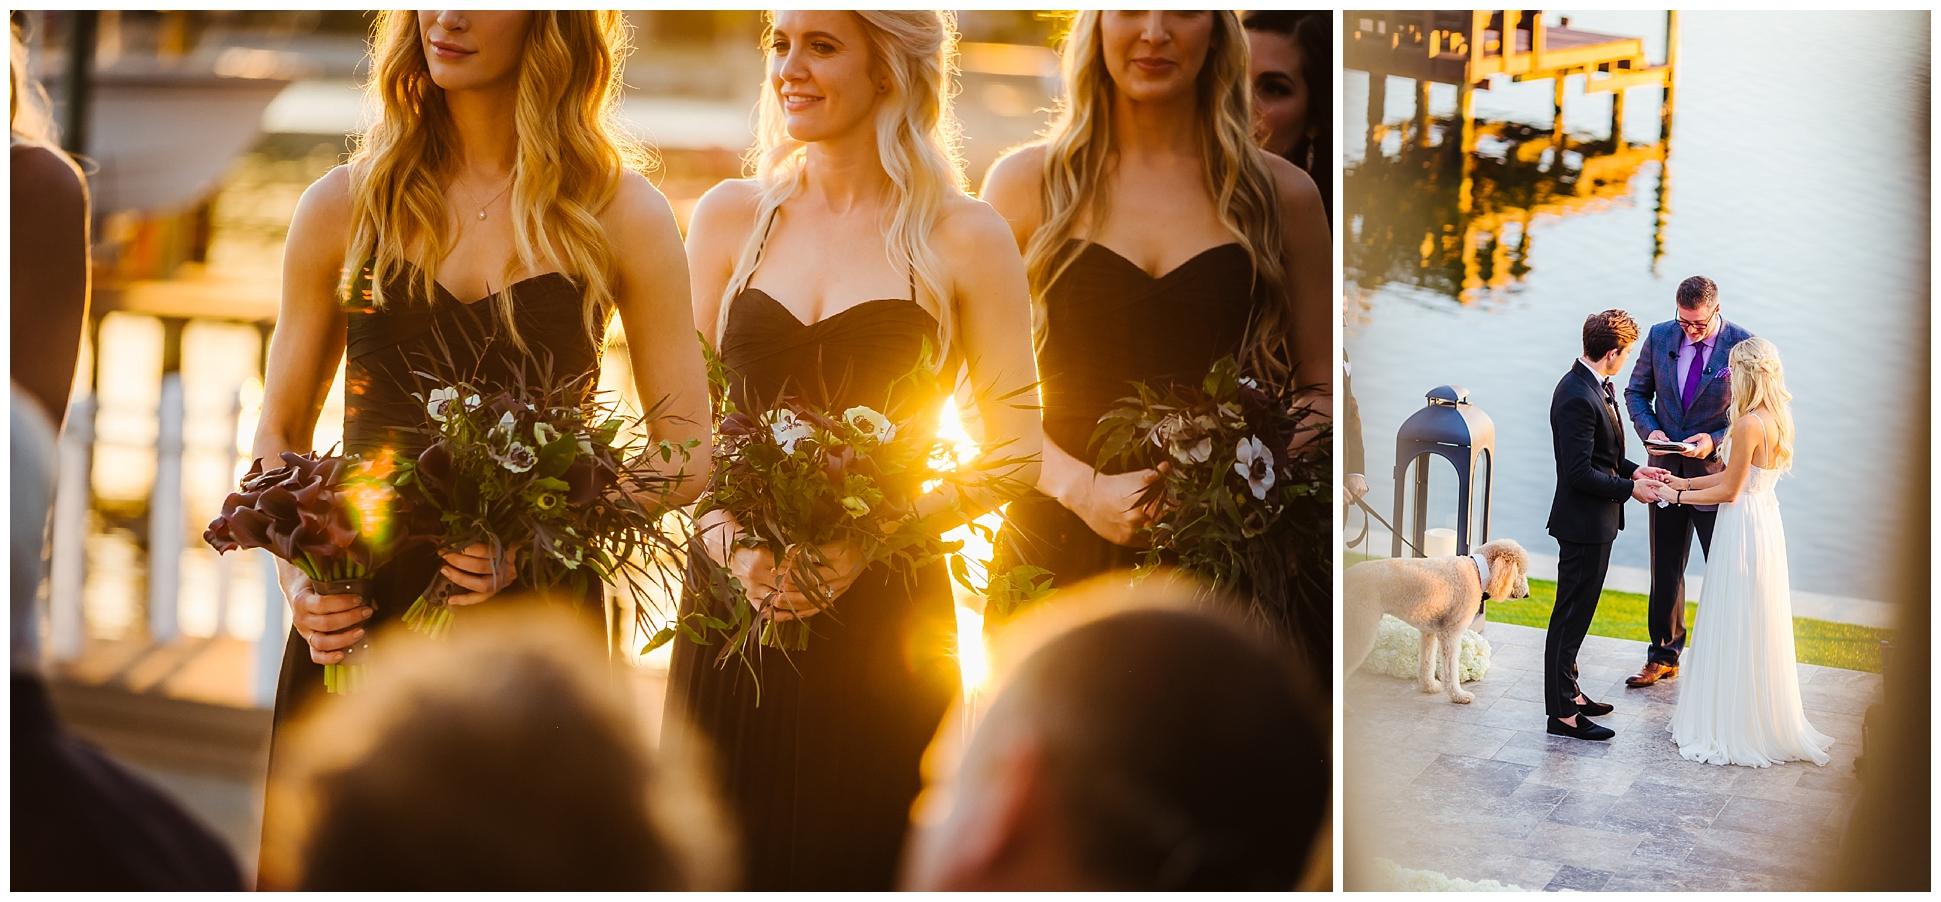 st-pete-wedding-photographer-backyard-luxury-snell-isle-vinoy_0041.jpg